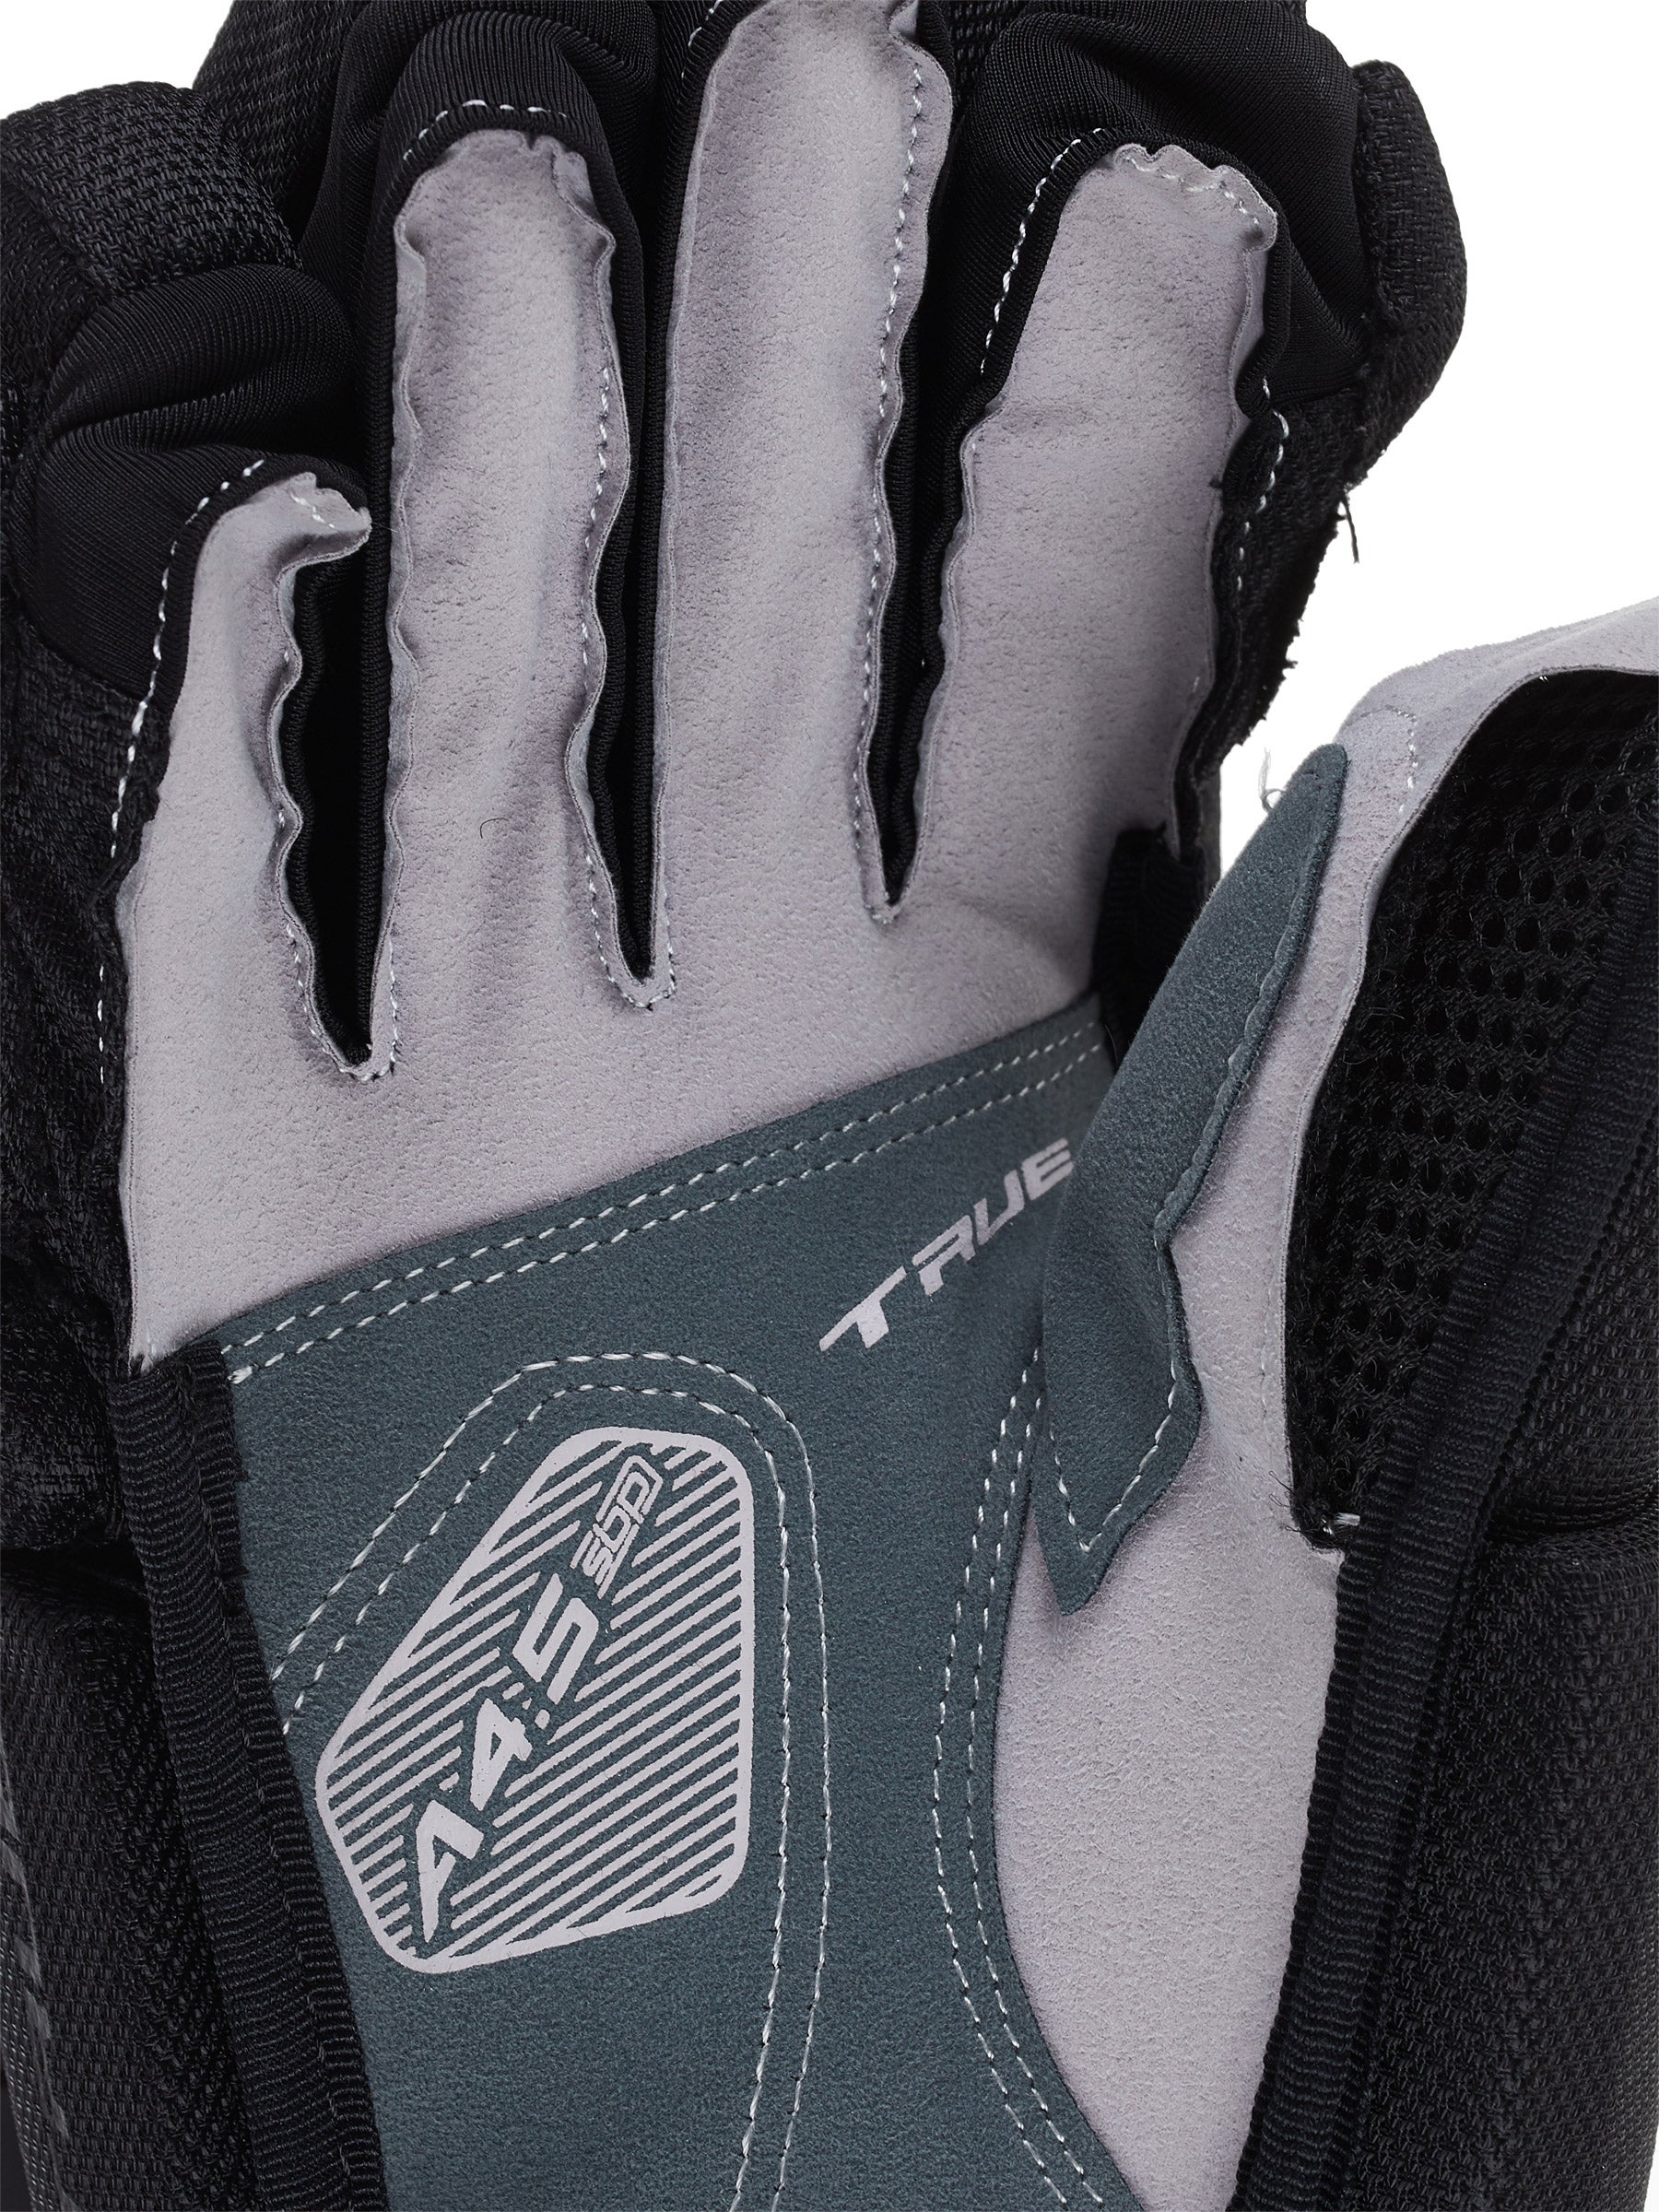 rukavice True A4.5